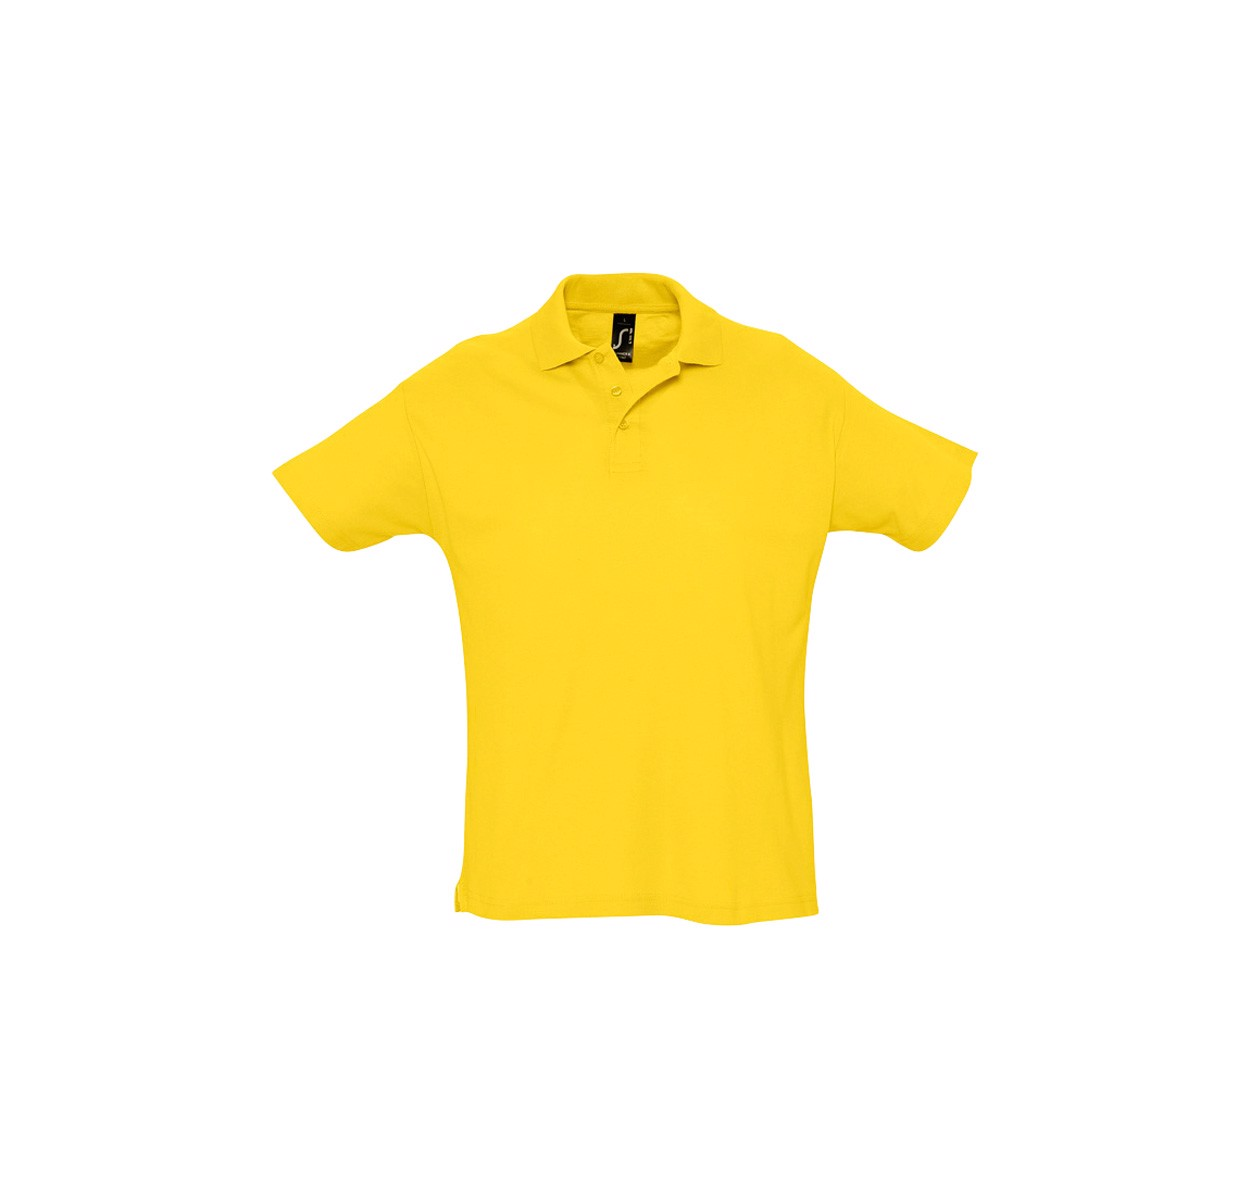 Polokošile Pique Summer II - Žlutá / M